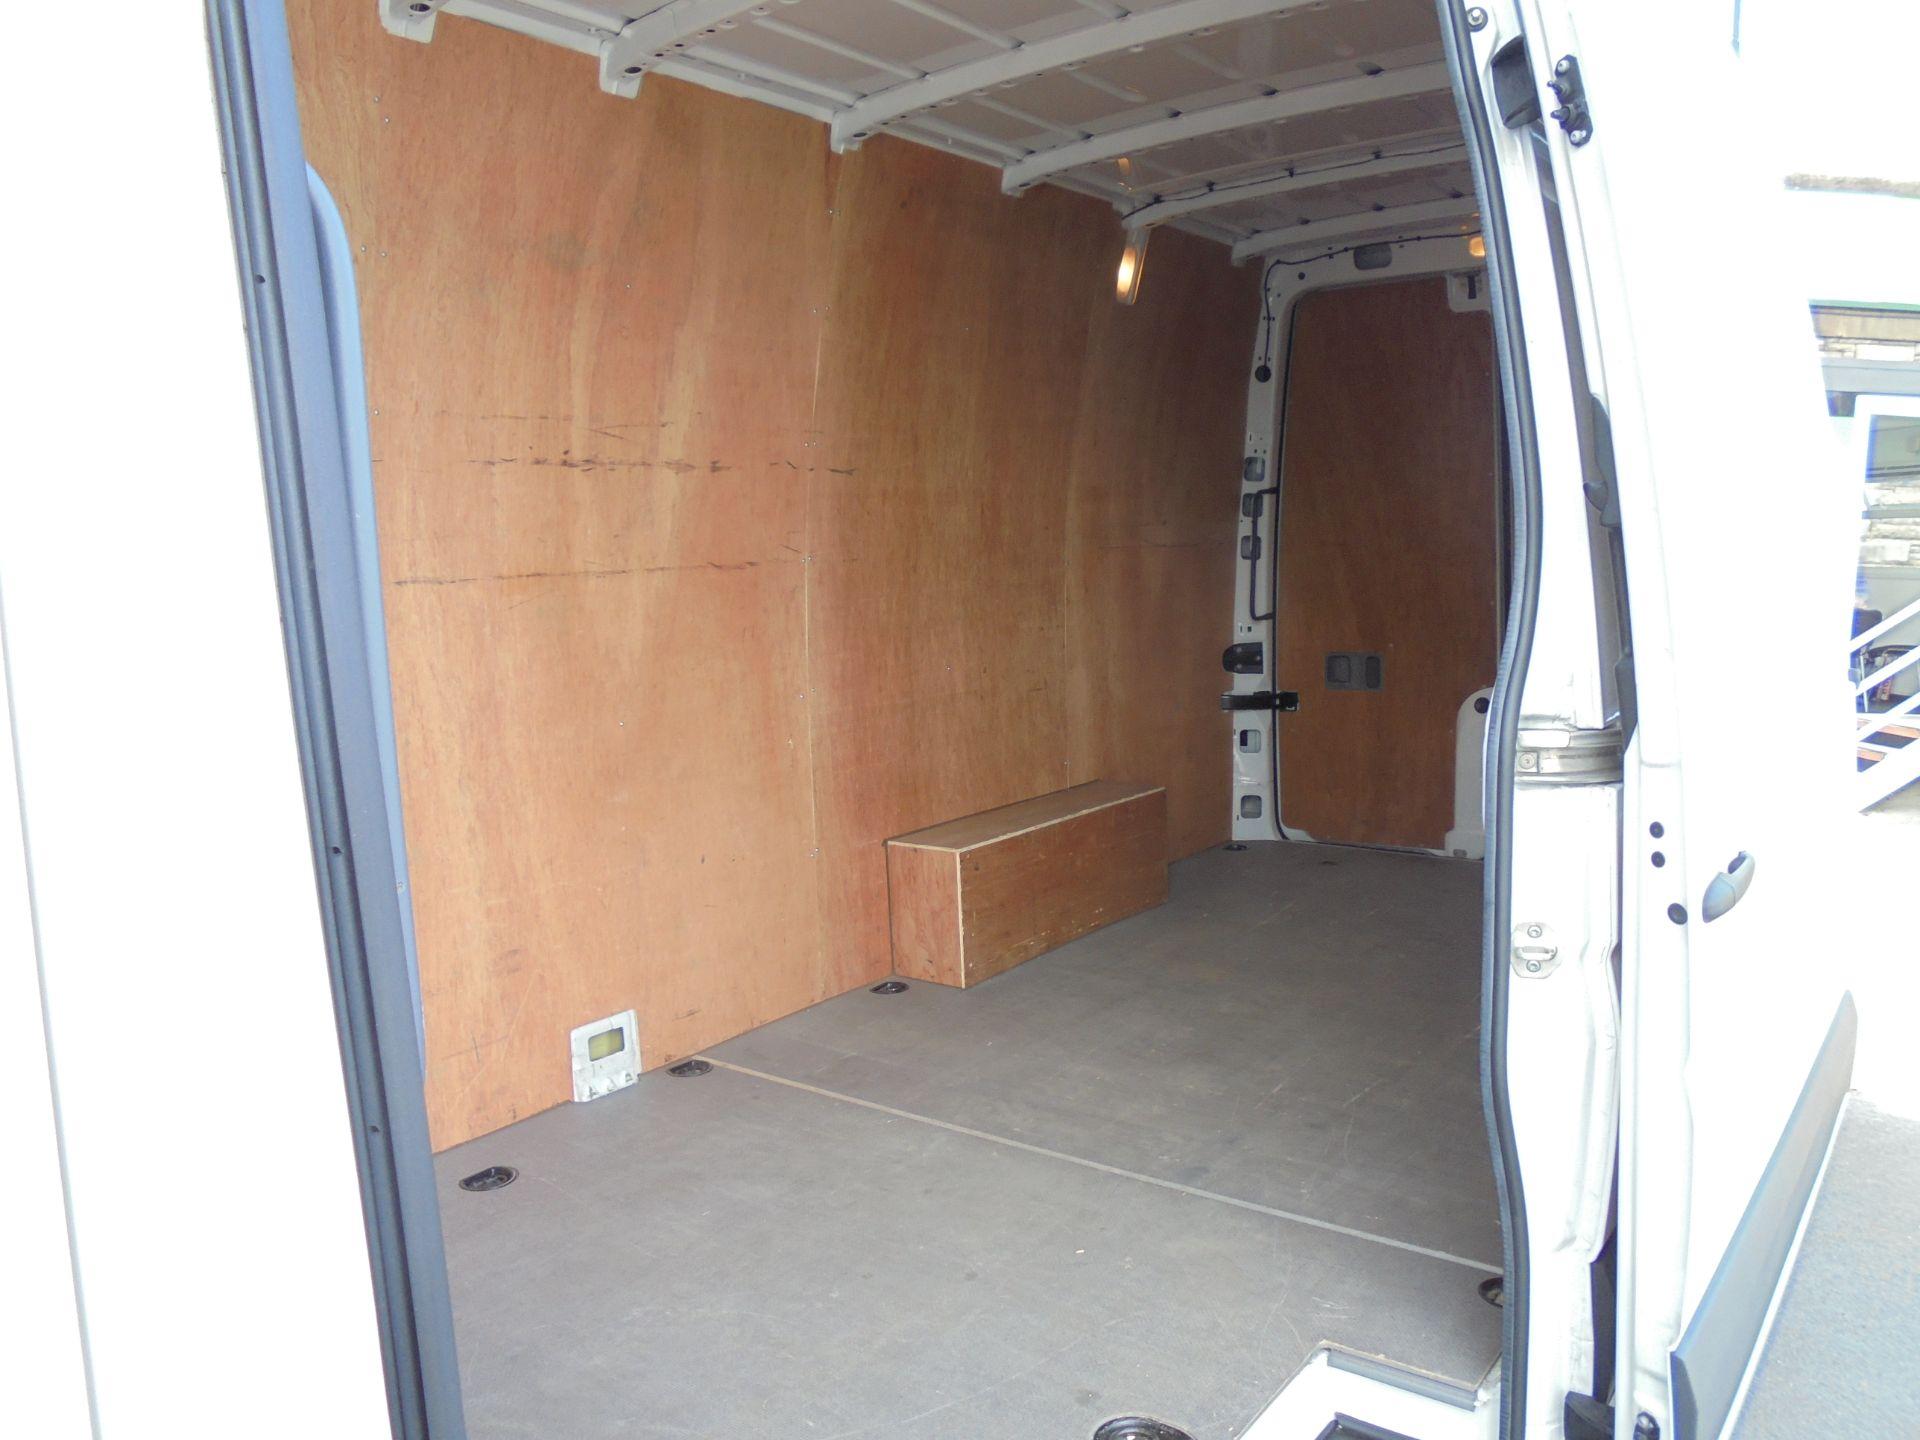 2018 Mercedes-Benz Sprinter 3.5T High Roof Van LWB (KY67LYS) Image 16